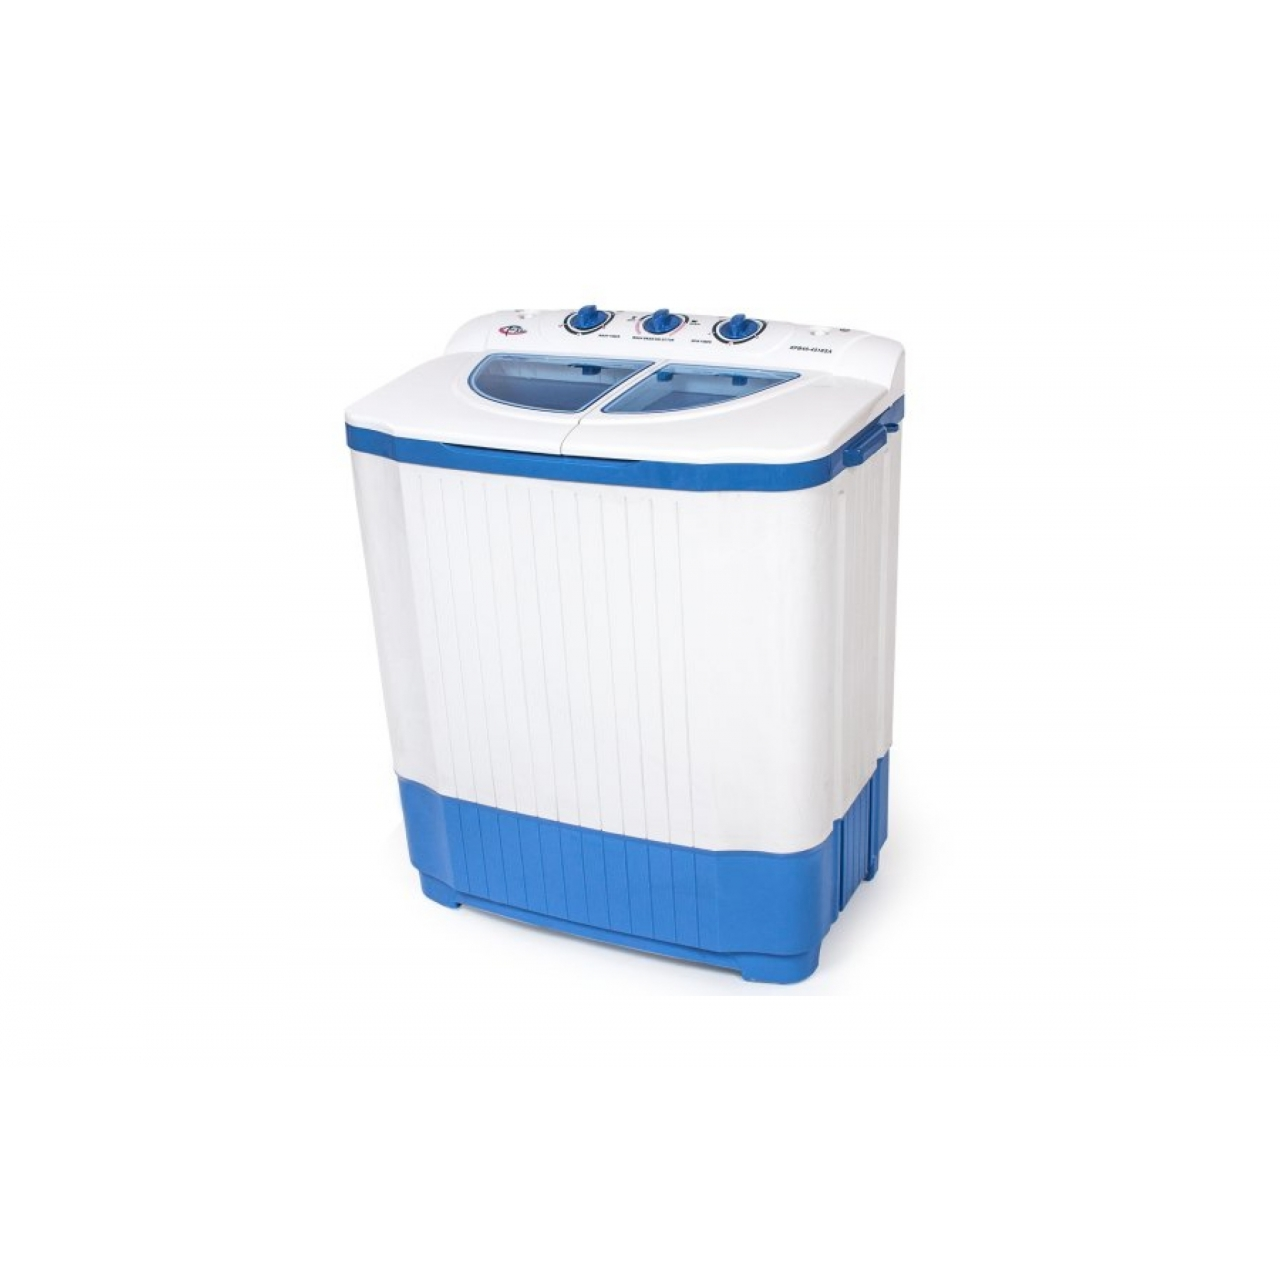 tectake 4 5 kg mini waschmaschine test. Black Bedroom Furniture Sets. Home Design Ideas